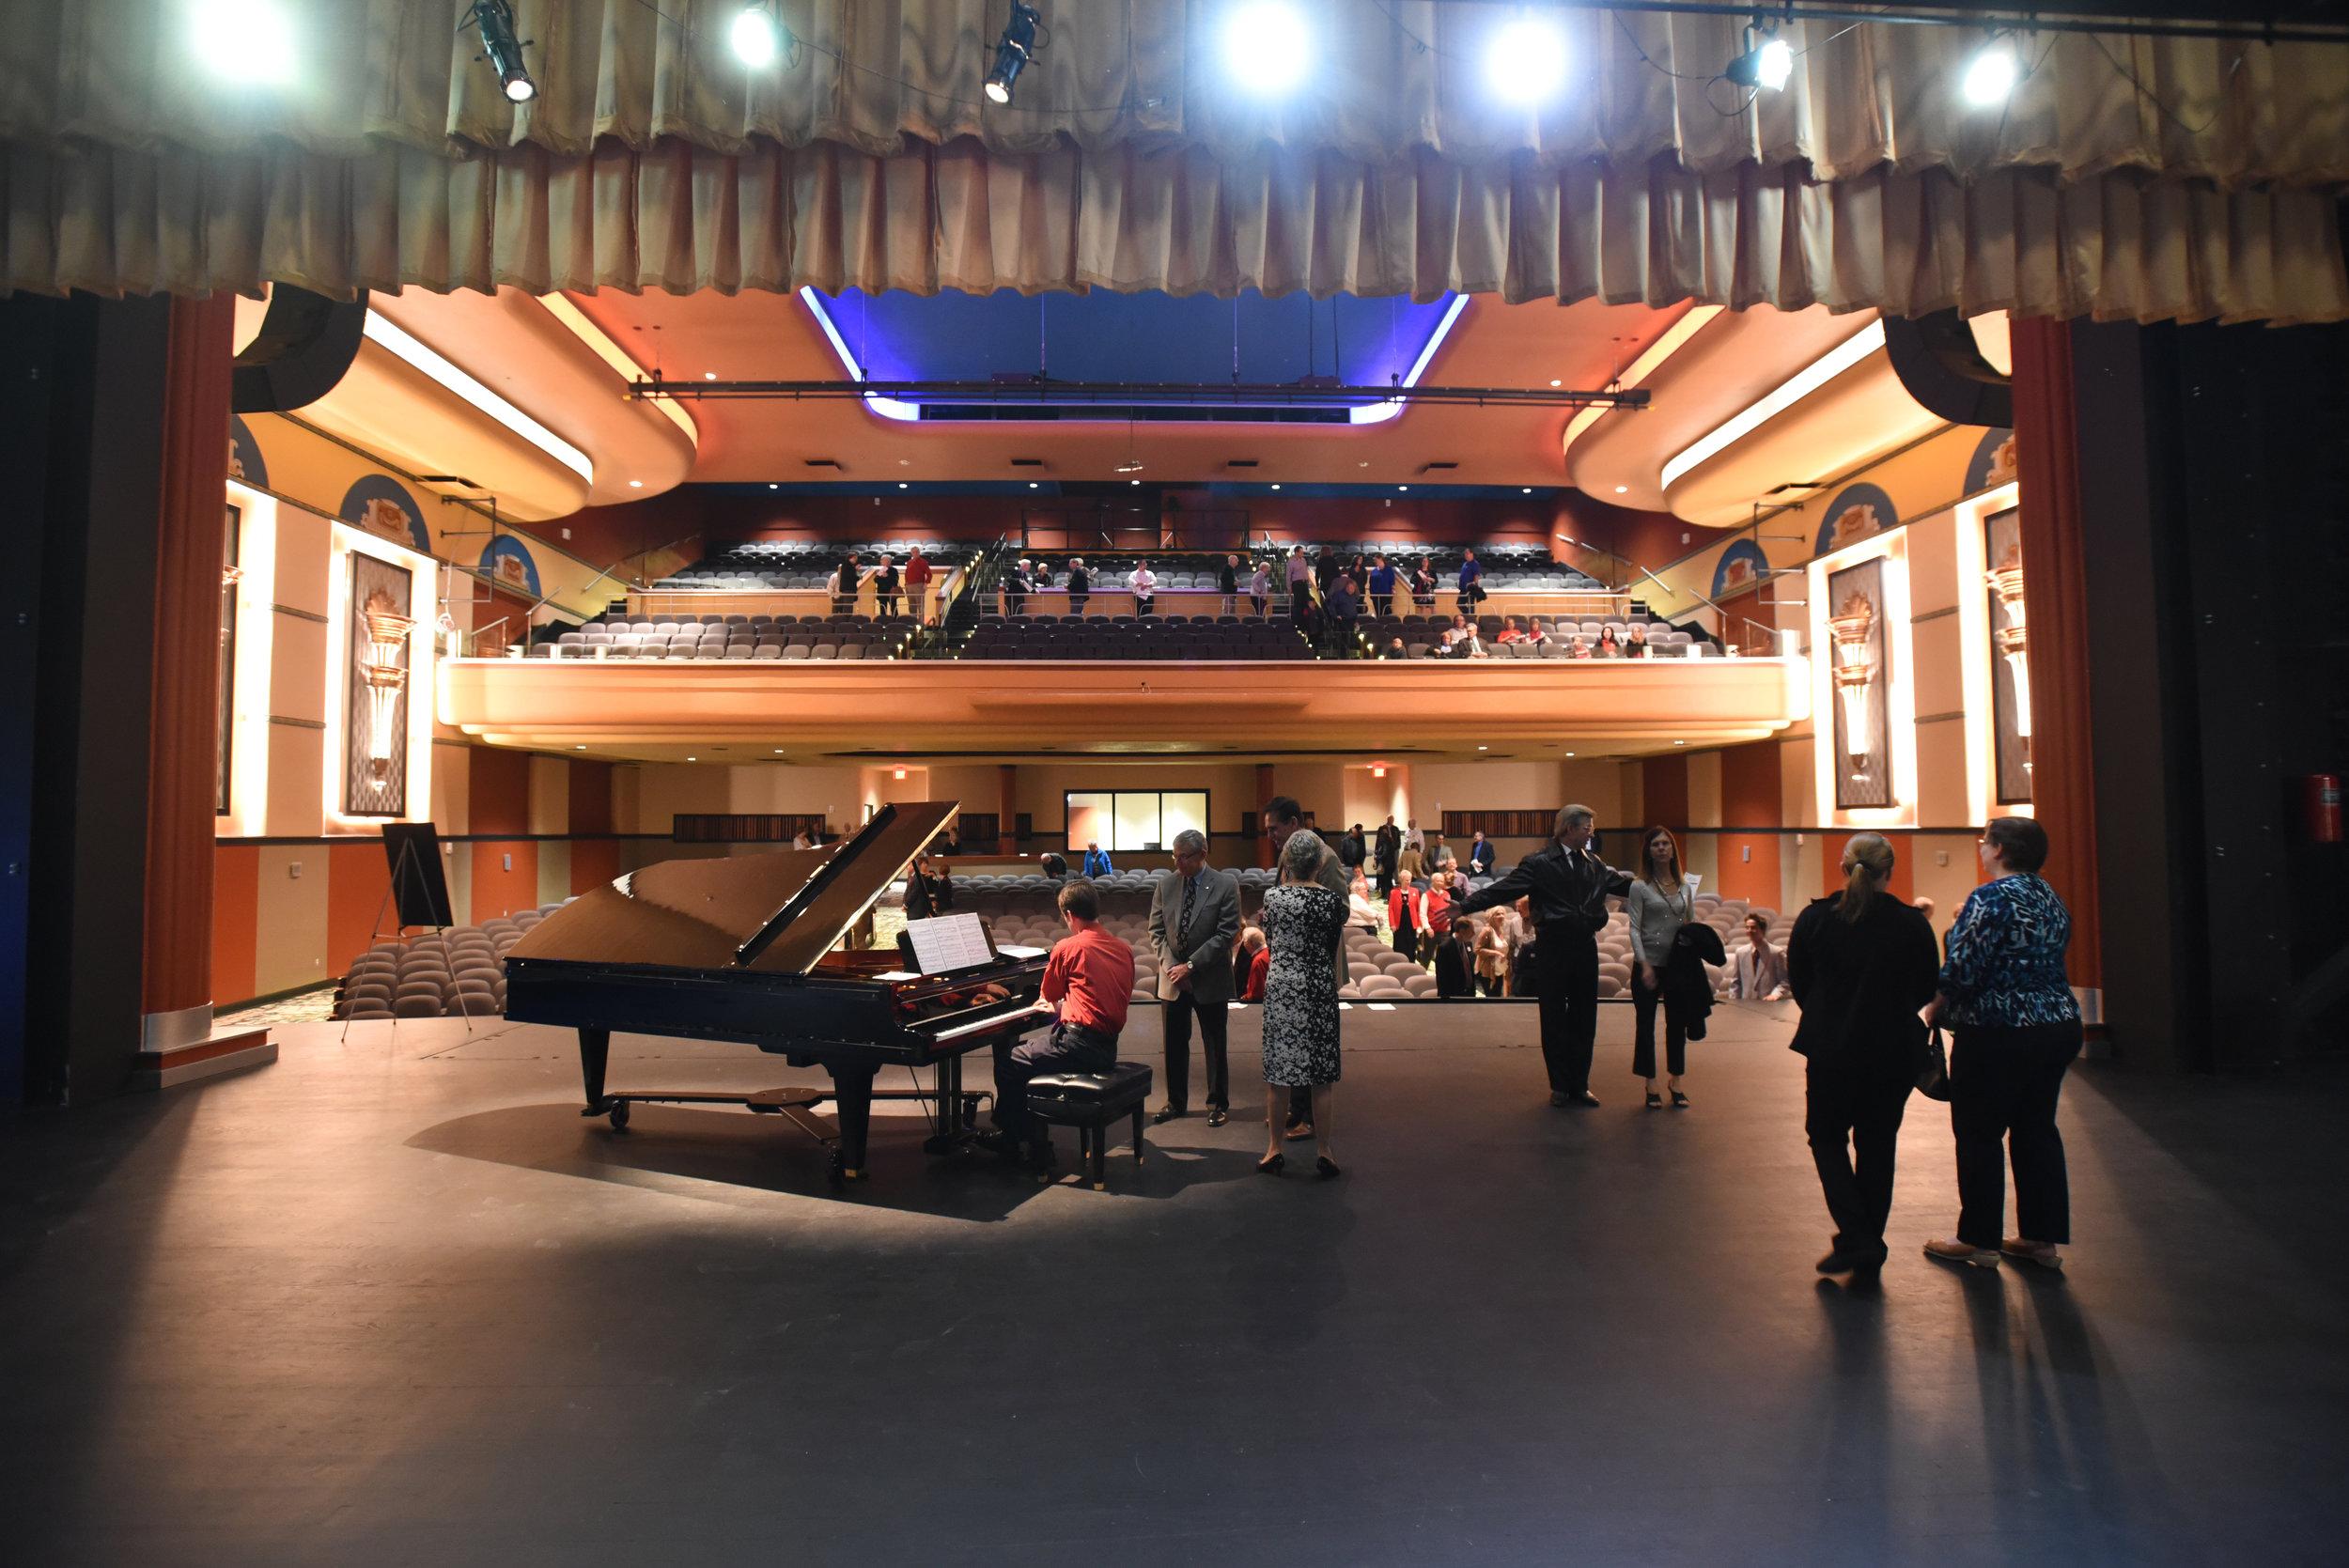 Marathon Center for Preforming Arts, Findlay